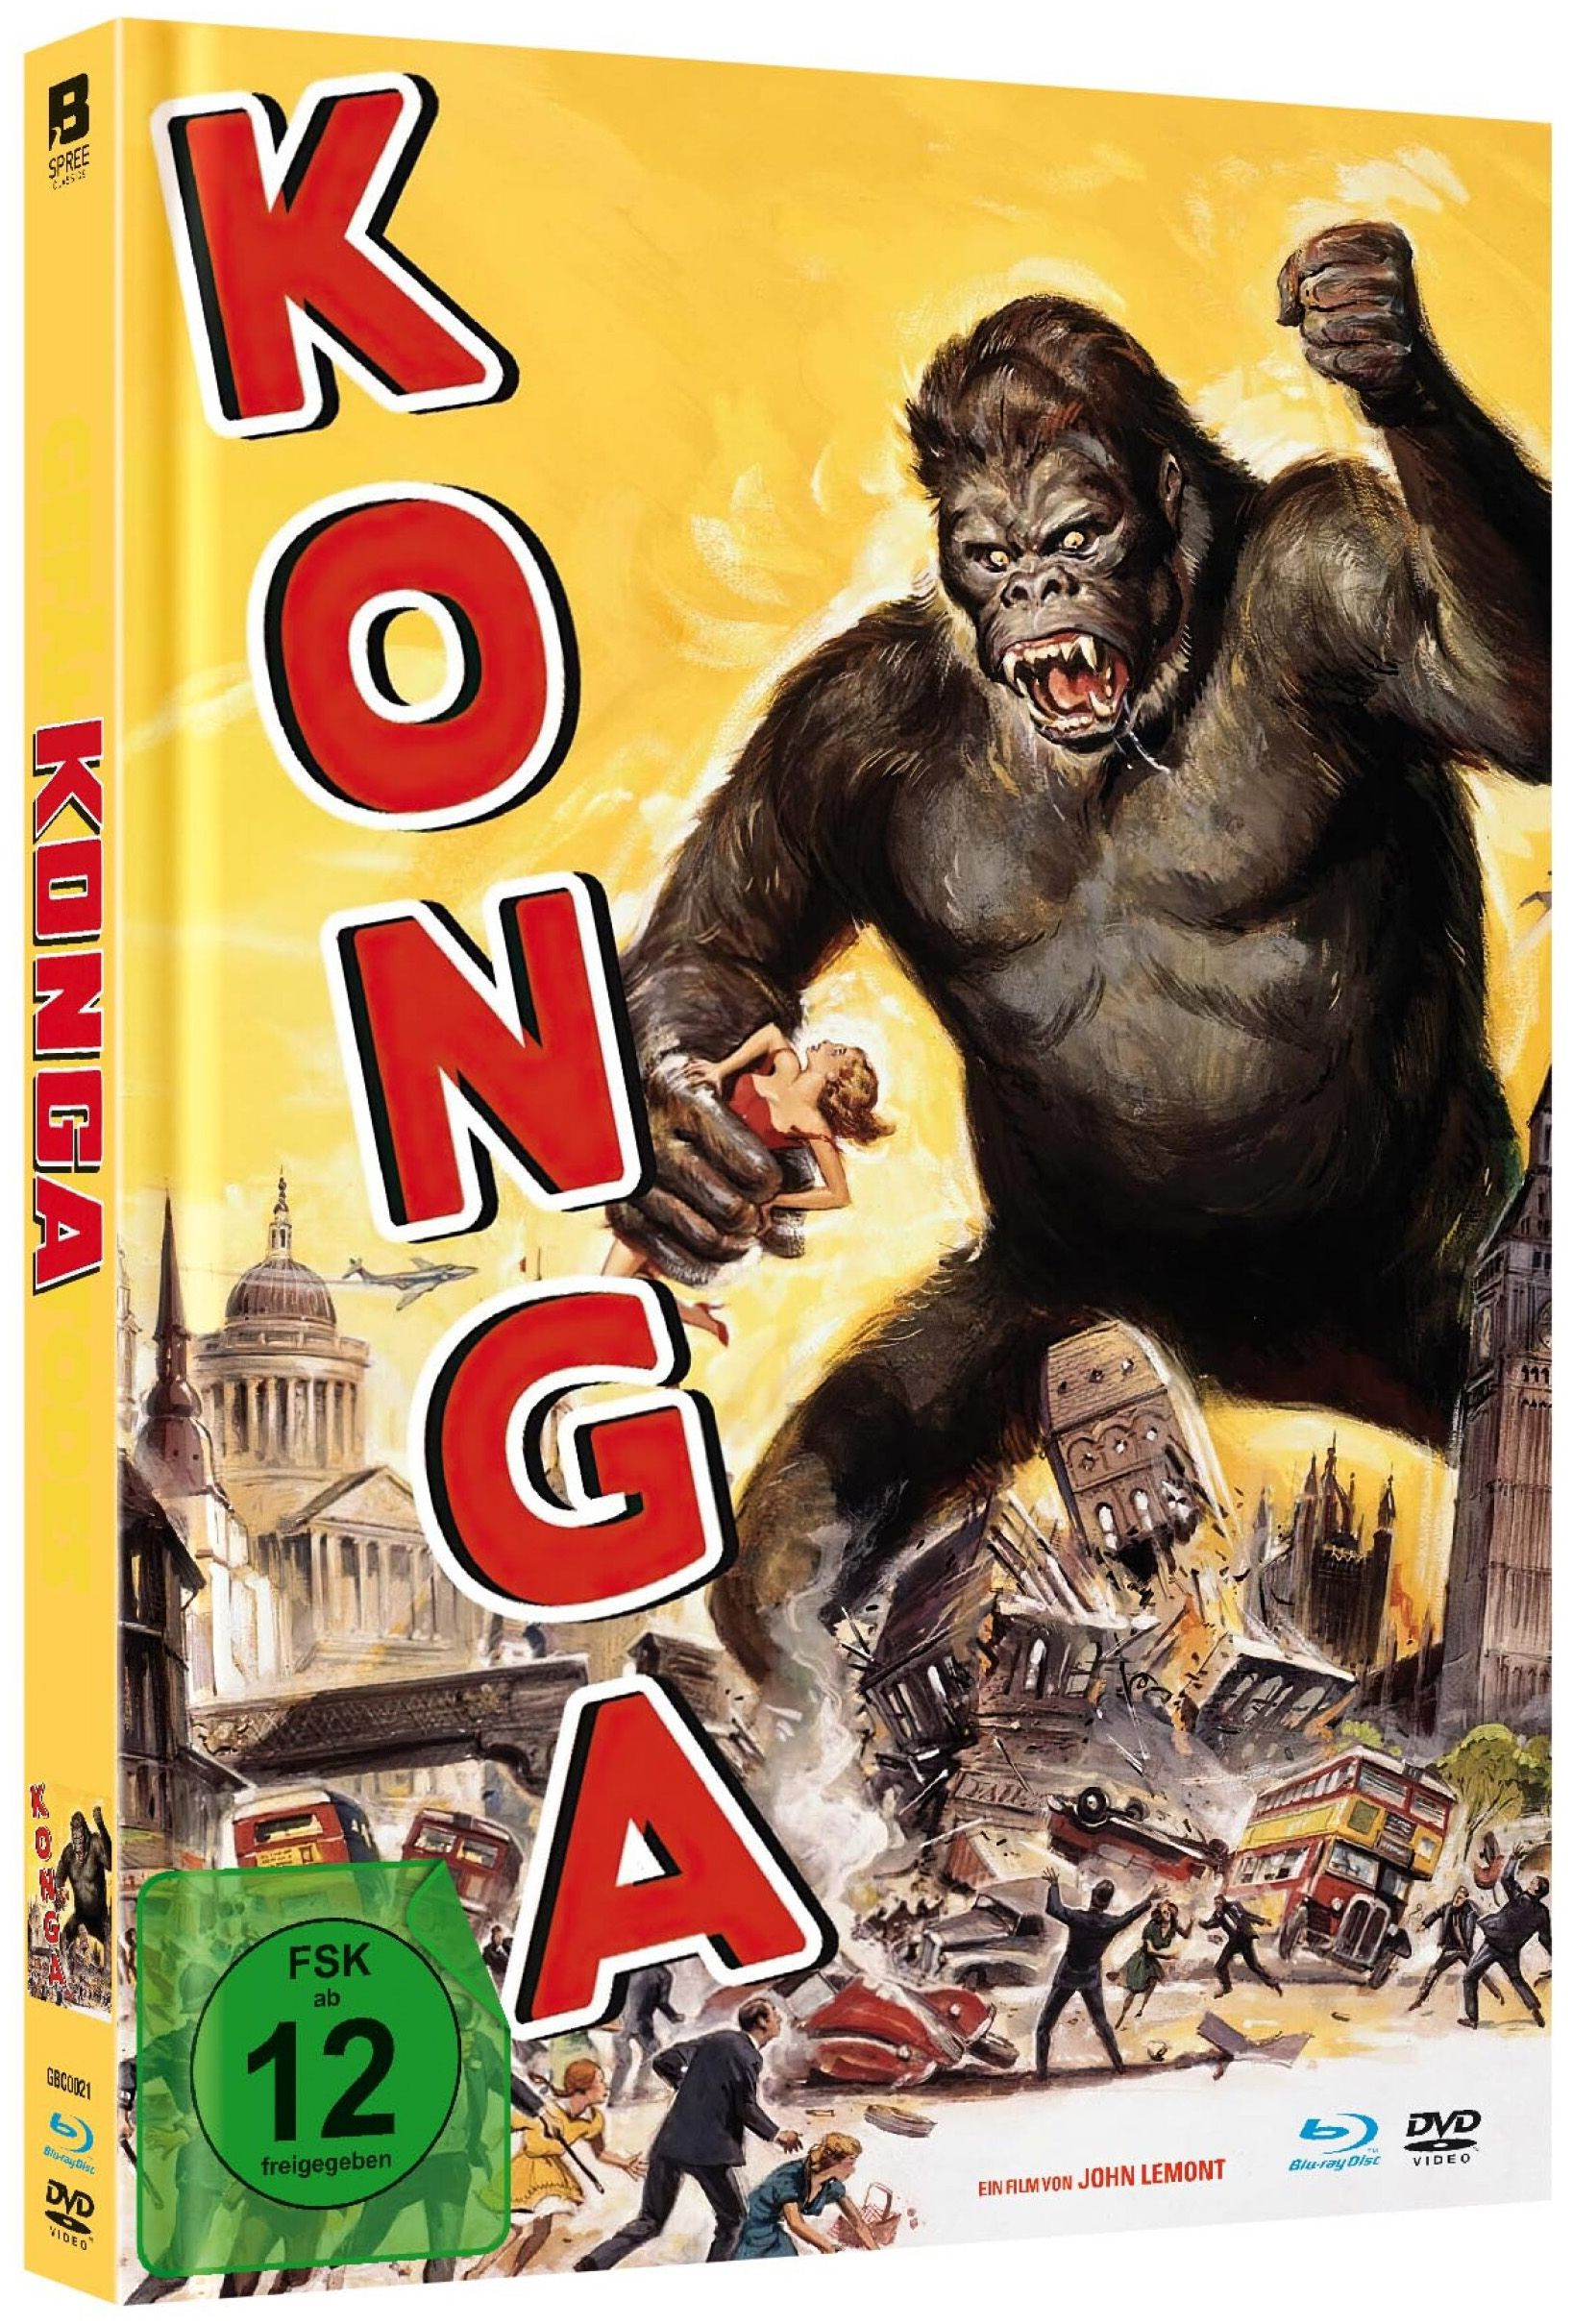 Konga - Erbe von King Kong (Lim. Uncut Mediabook) (DVD + BLURAY)